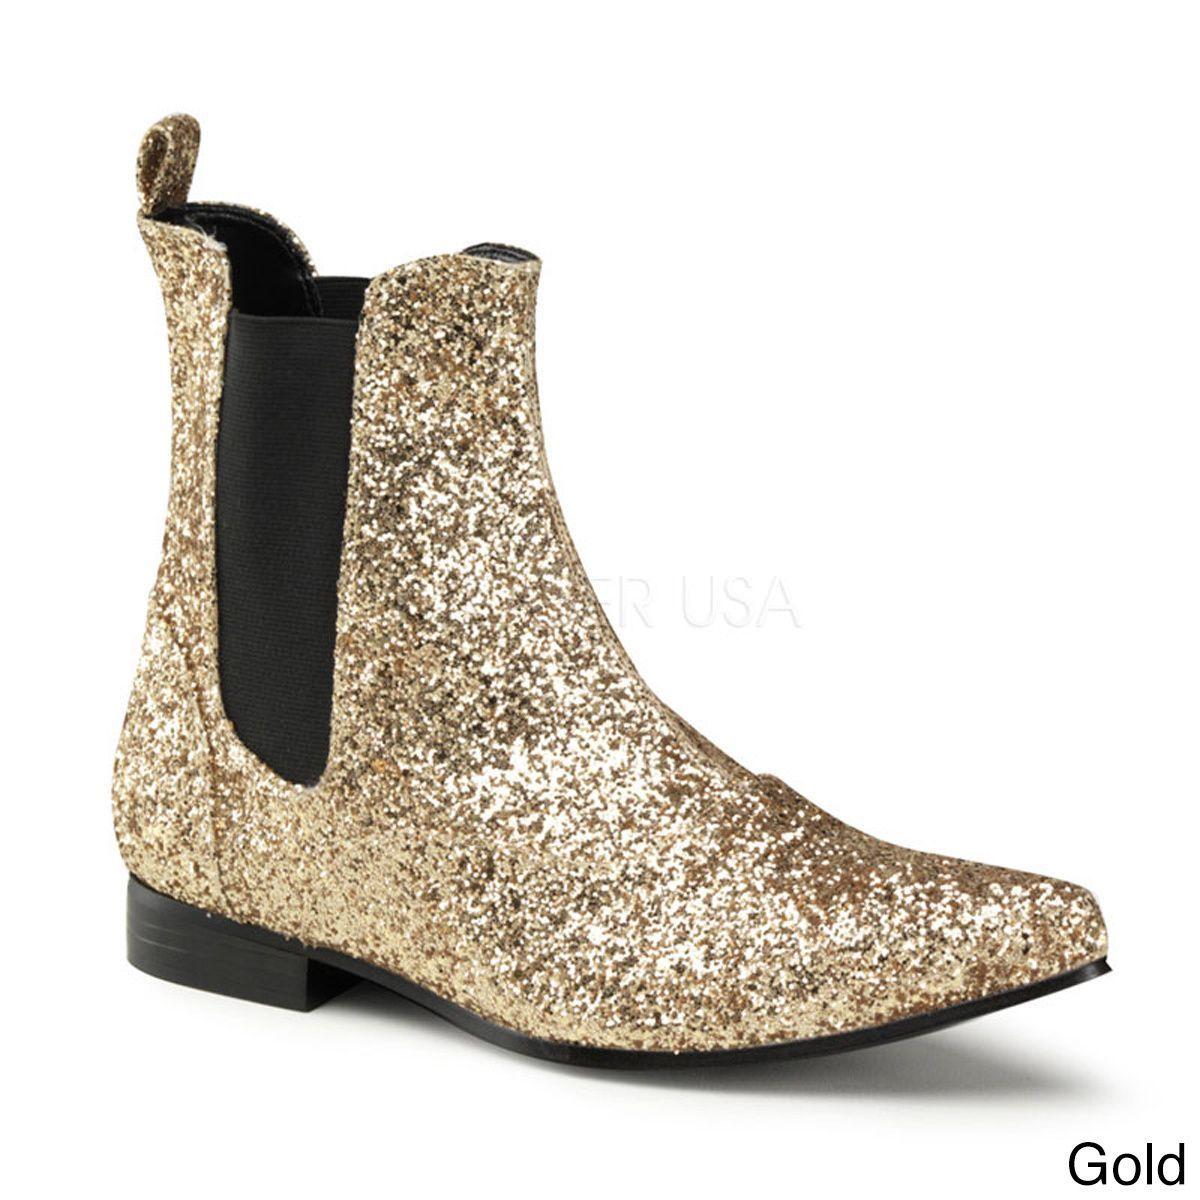 Chelsea-58G, Mens Ankle Boots Funtasma